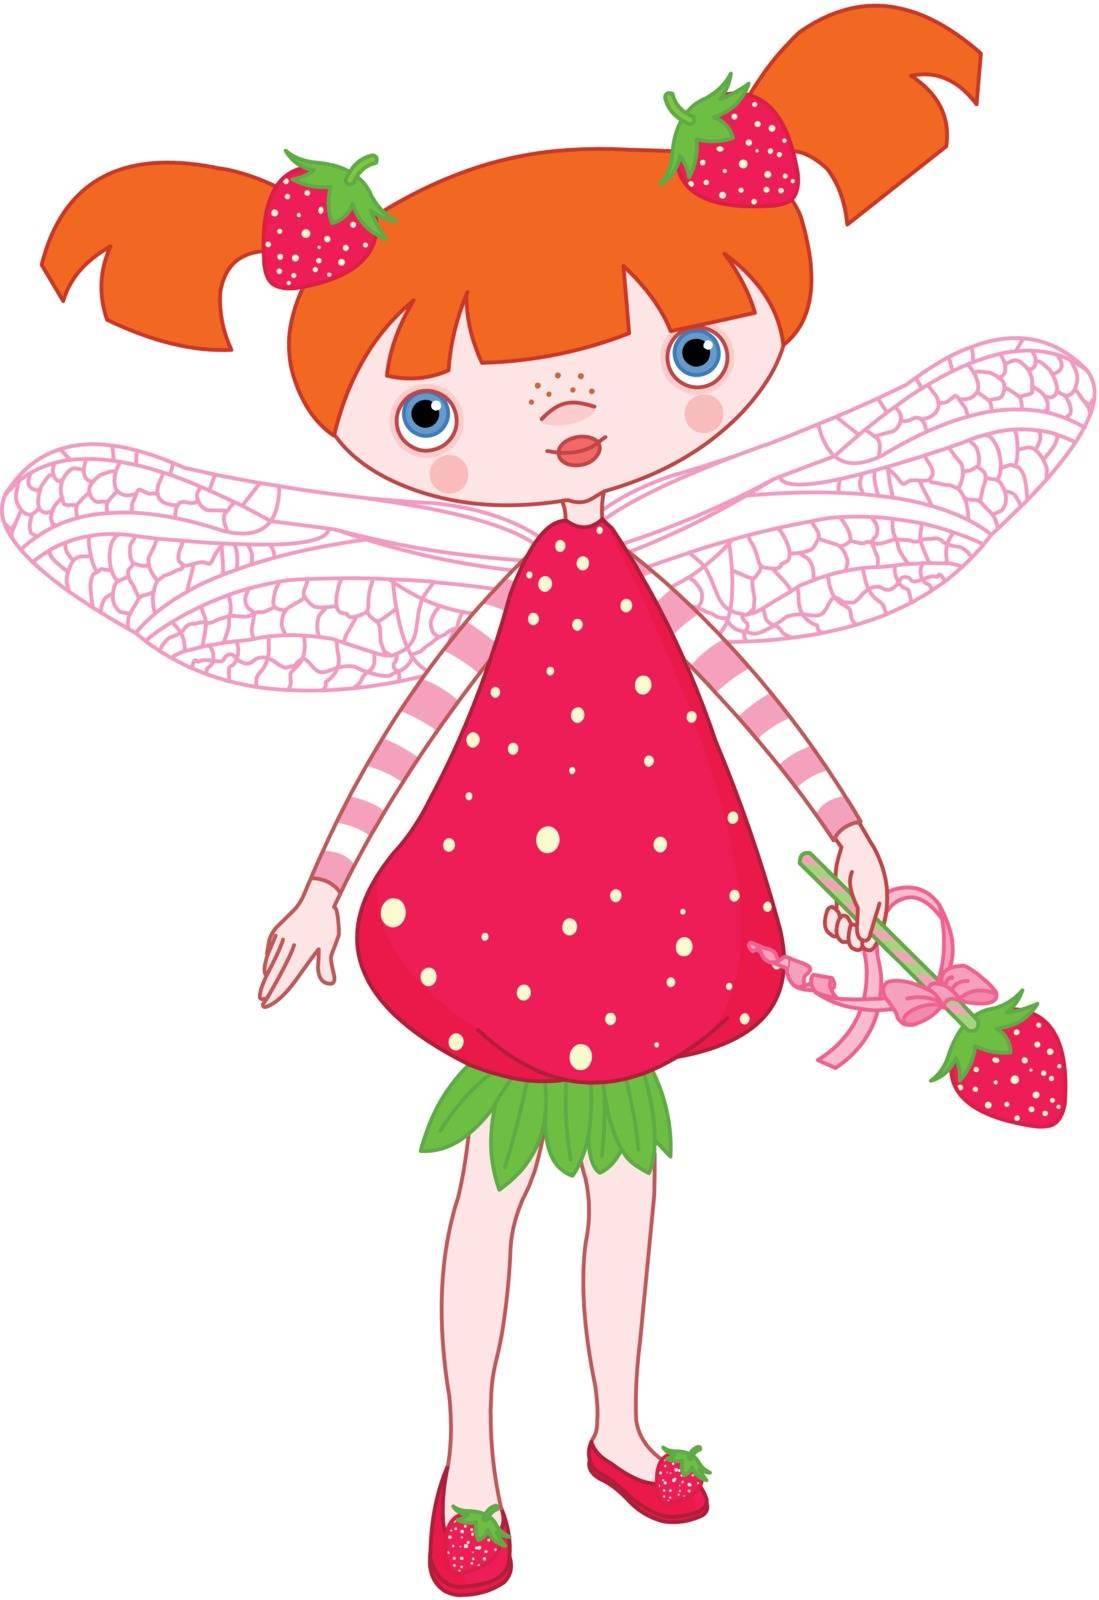 Illustration of cute strawberry fairy